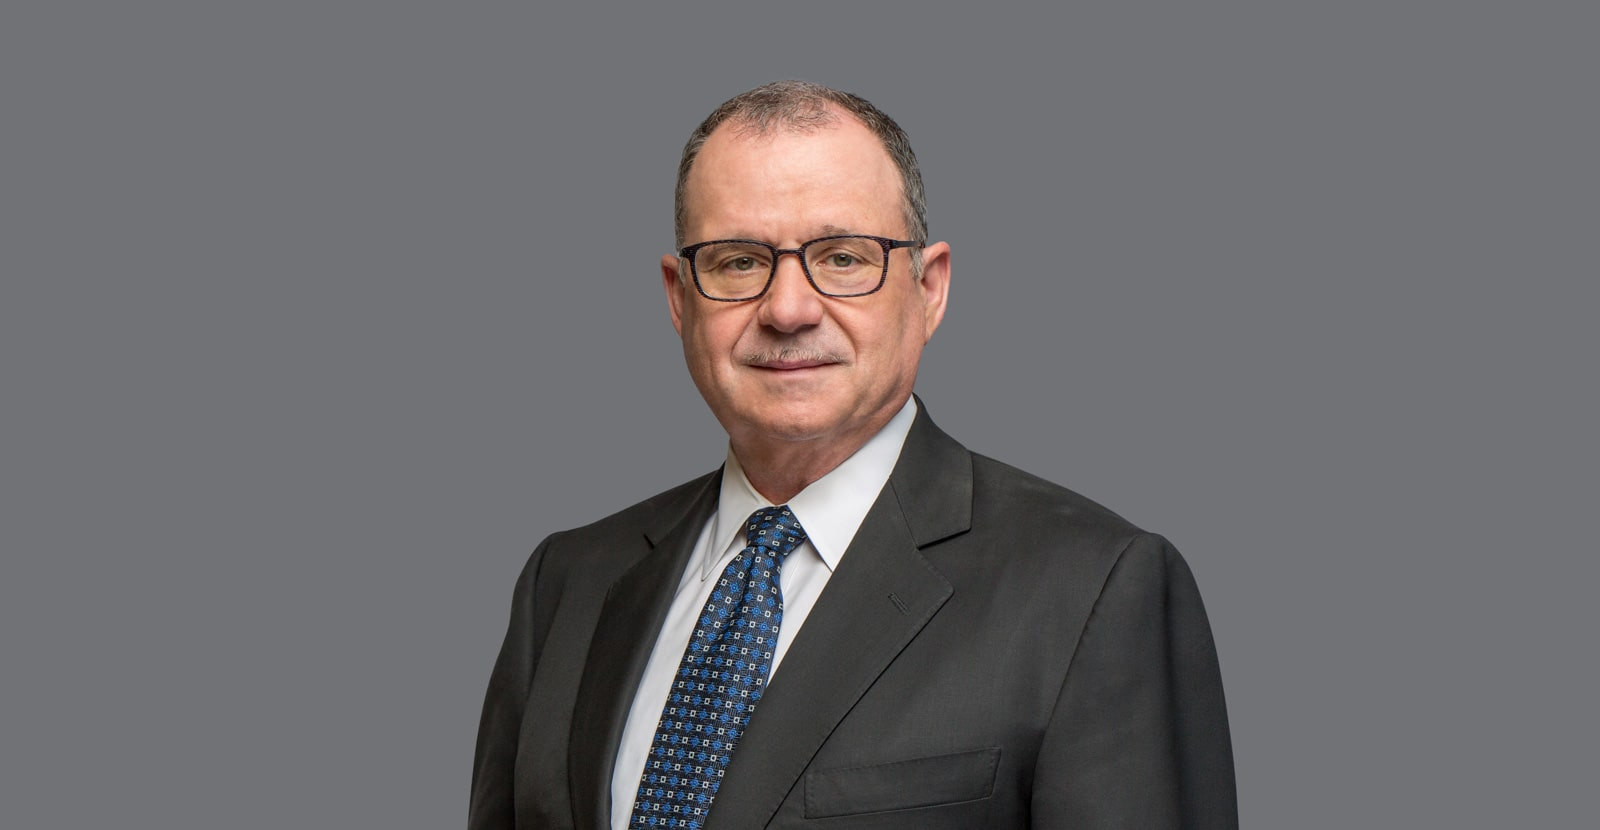 David-Merner